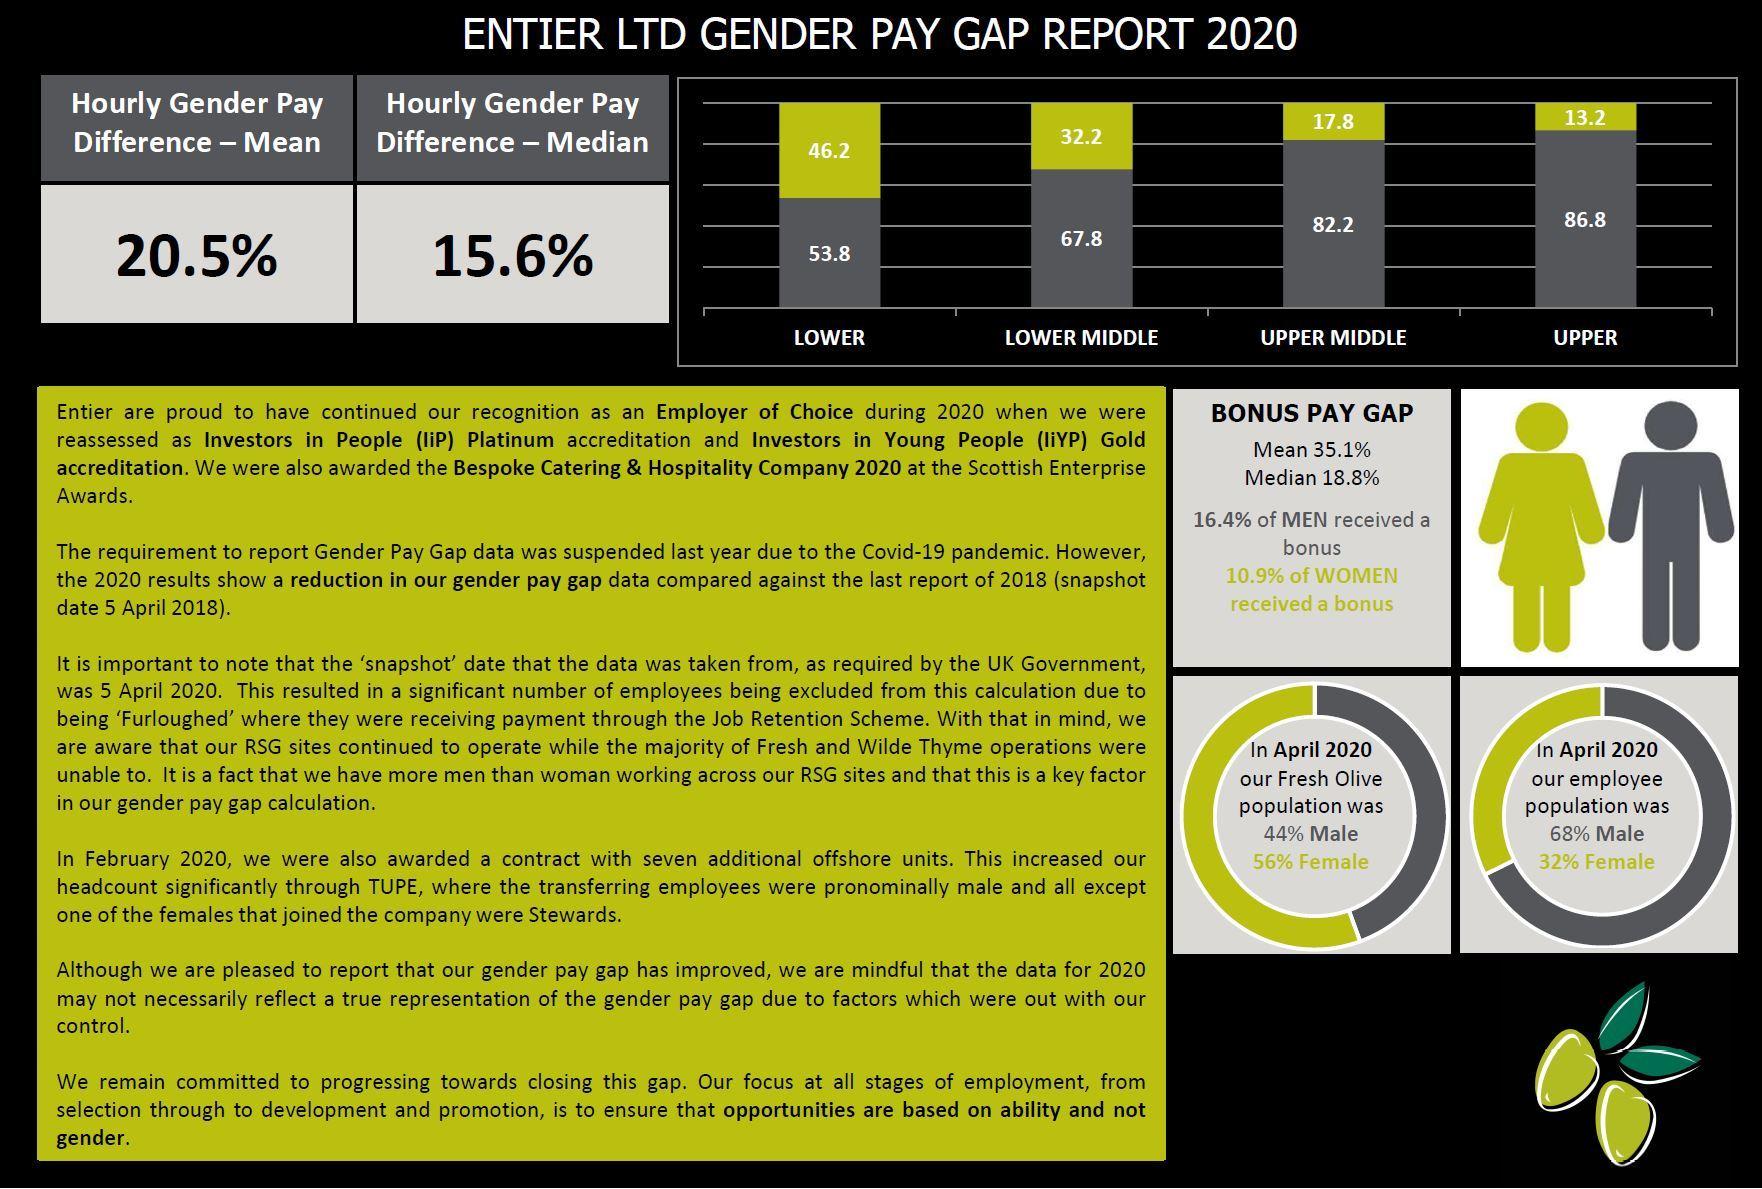 Gender Pay Gap Report 2020